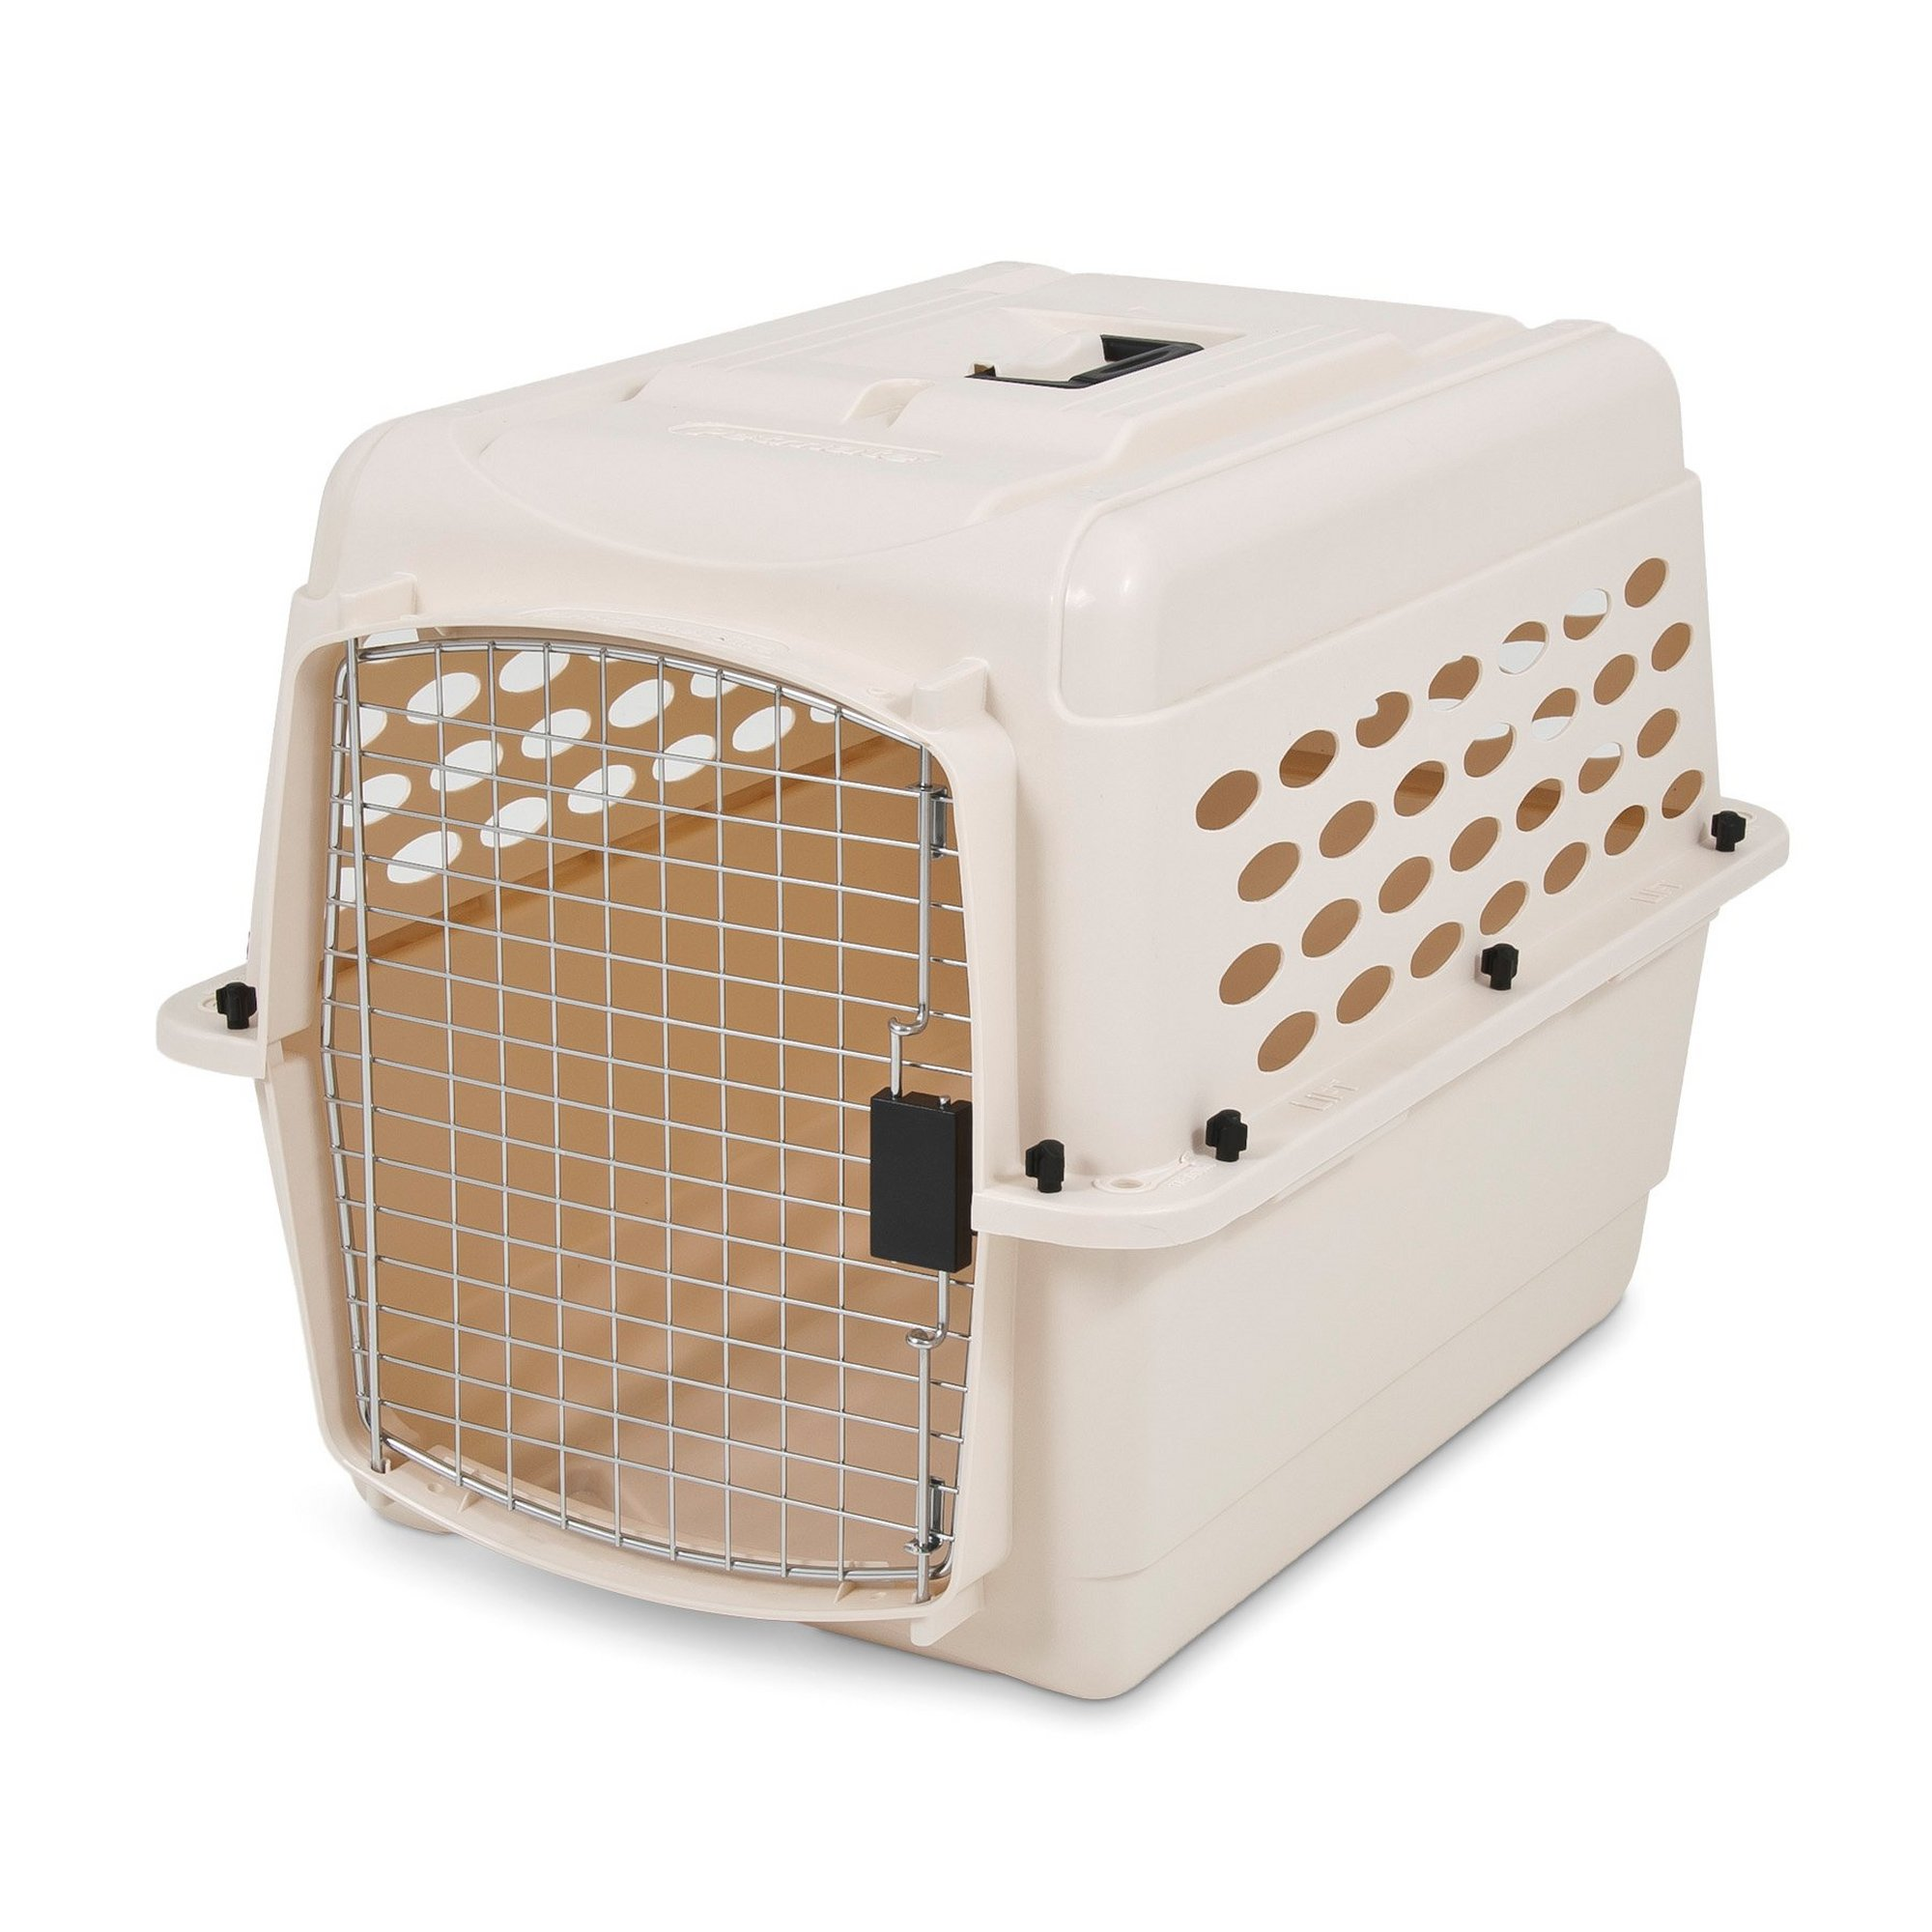 Image of Vari Kennel II Traditional Pet Carrier - Medium